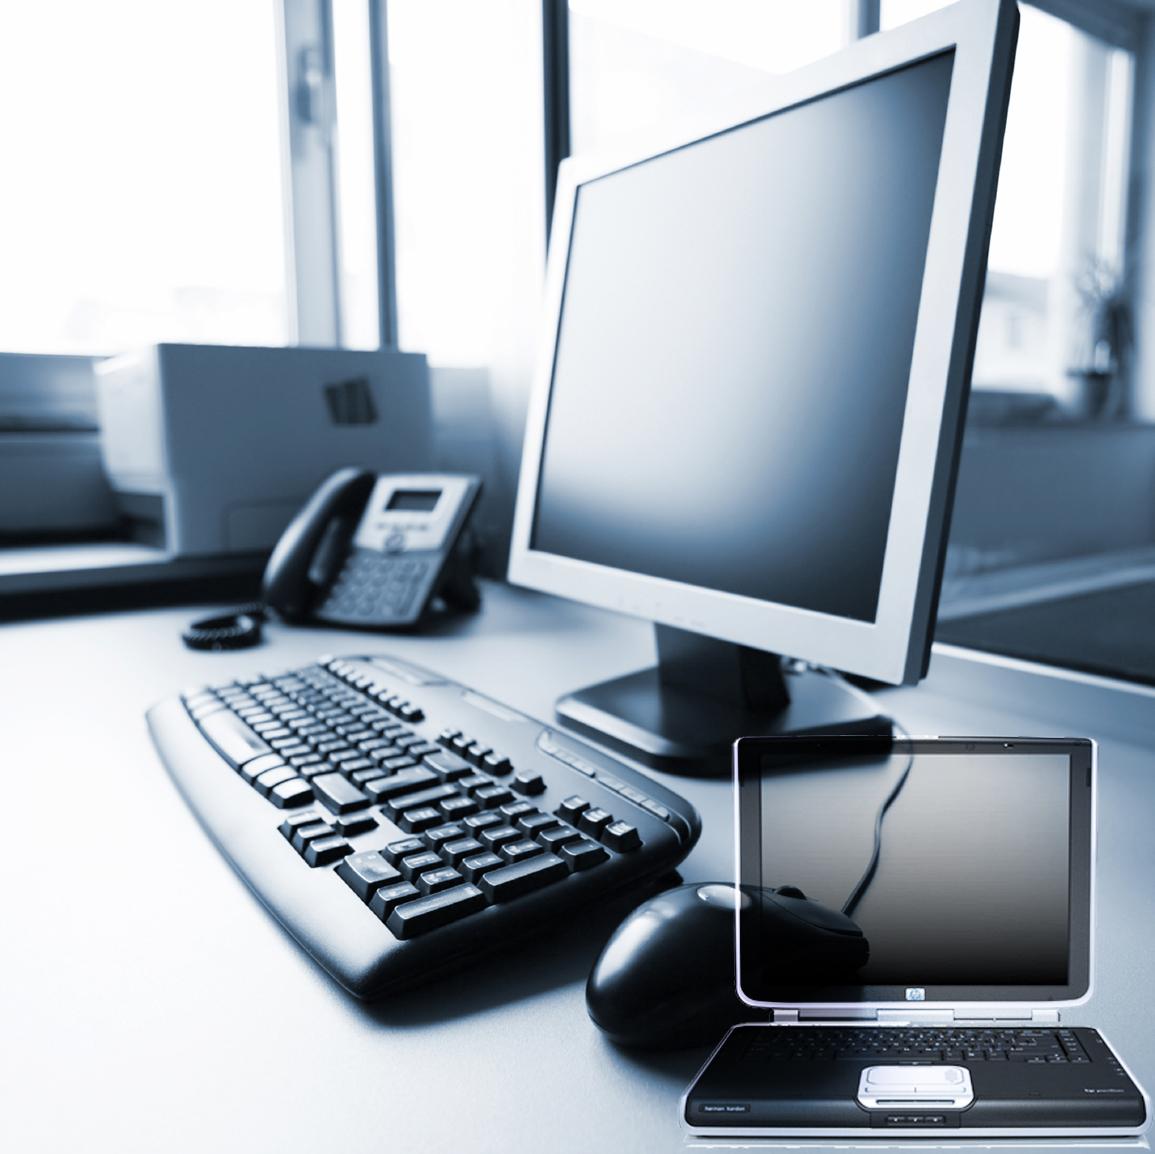 Computer computer computer